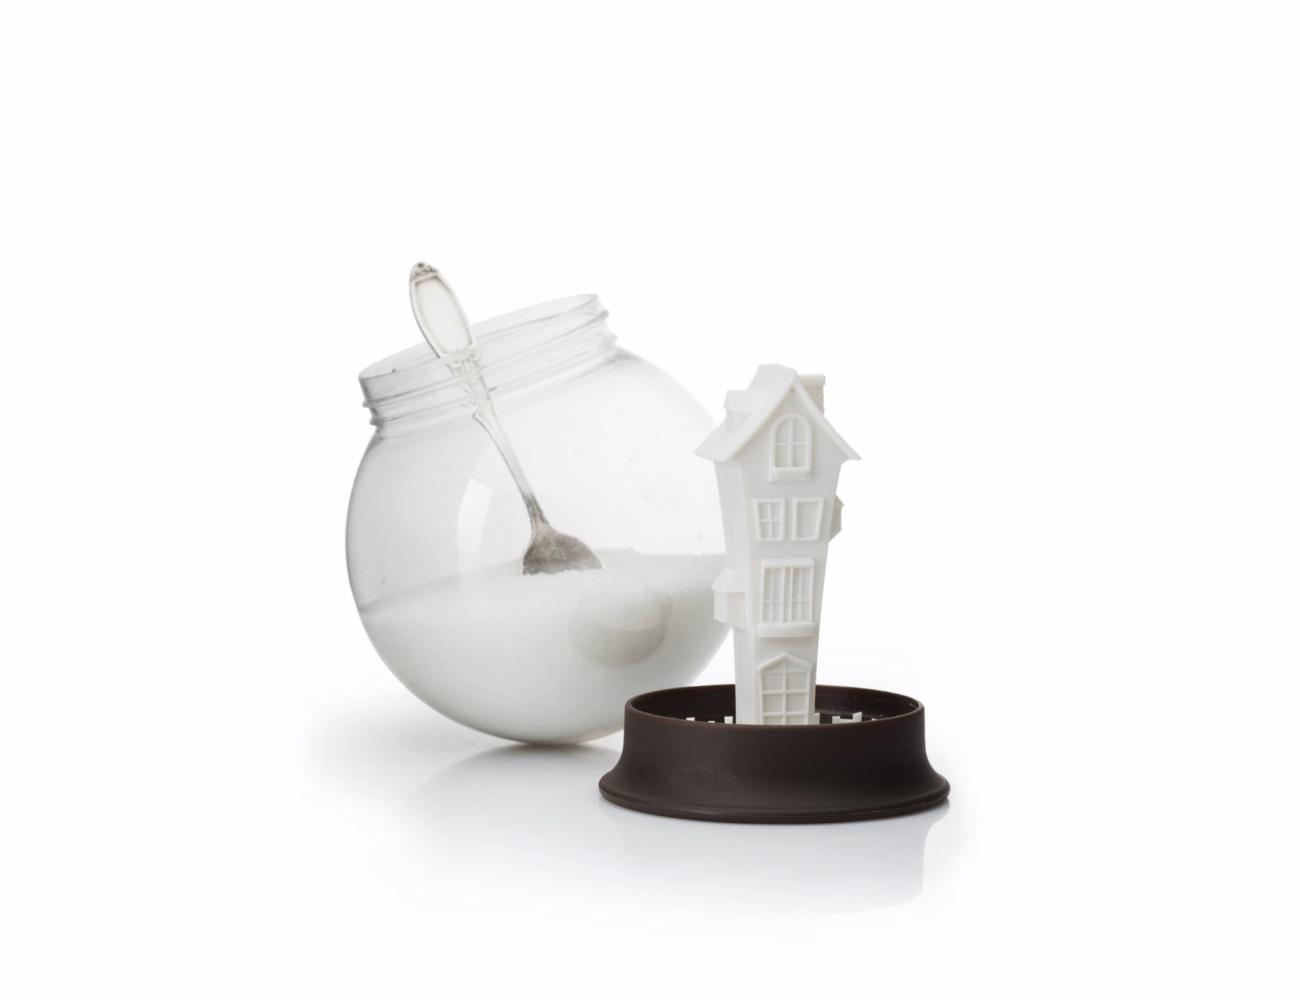 Sugar House Sugar Bowl – Unique Design for Your Kitchen Shelf